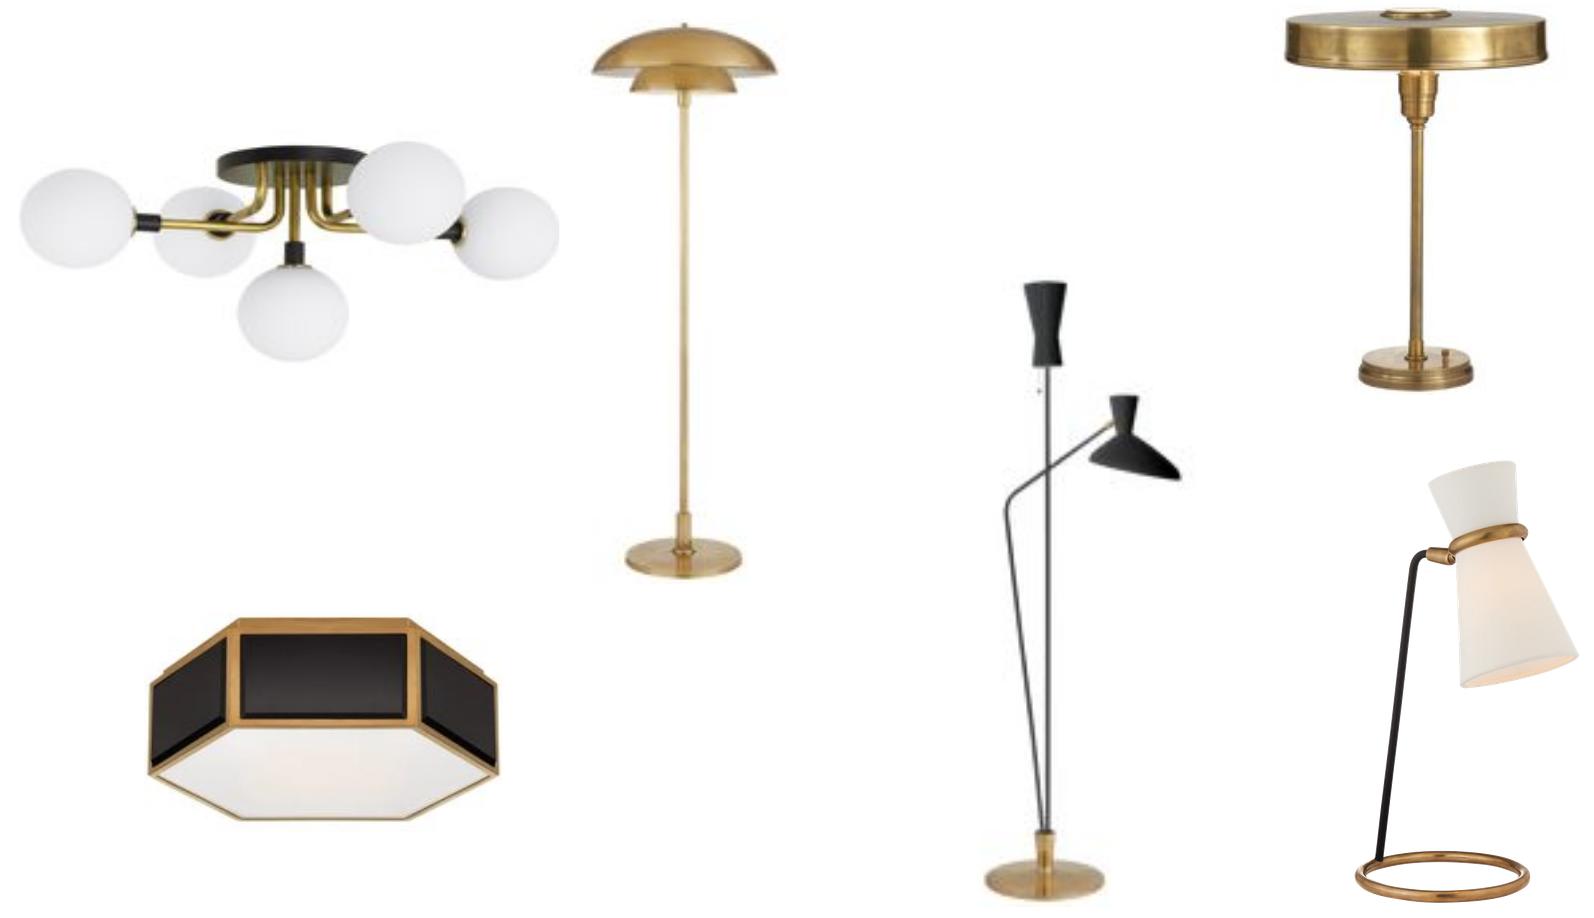 Lighting options for ceiling, floor and desks.